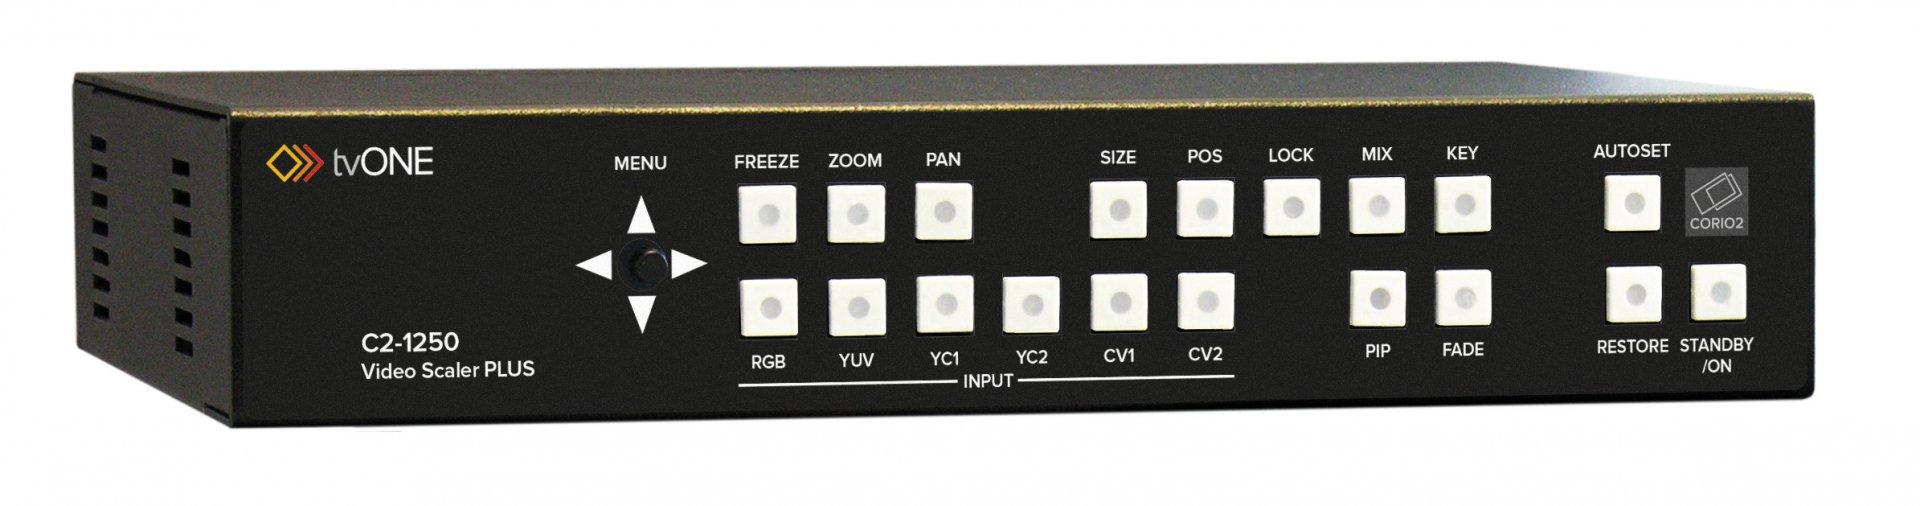 c2-1250-iso